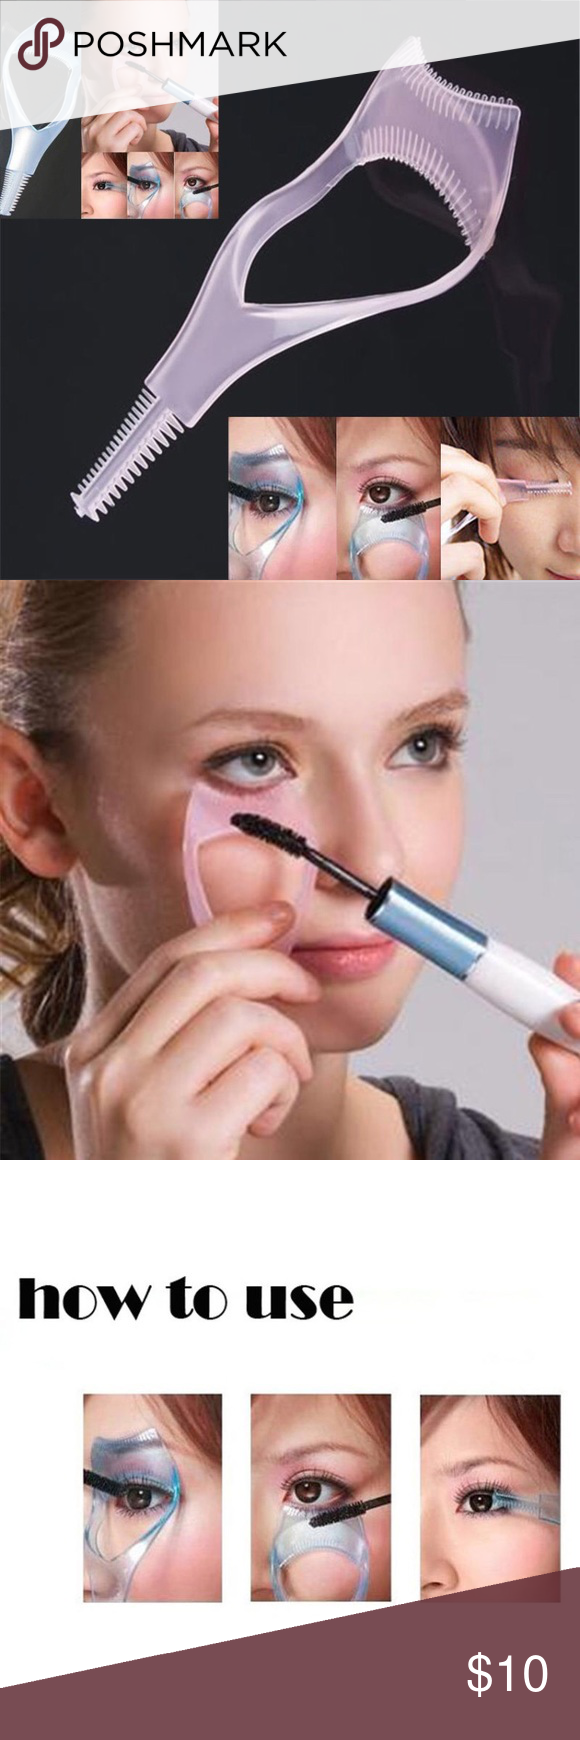 9f31b7417ba Eyelash tool 3 in 1 Makeup Mascara shield Guard Eyelash tool 3 in 1 Makeup Mascara  shield Guard Curler Applicator comb Guide New in package Light Blue last ...